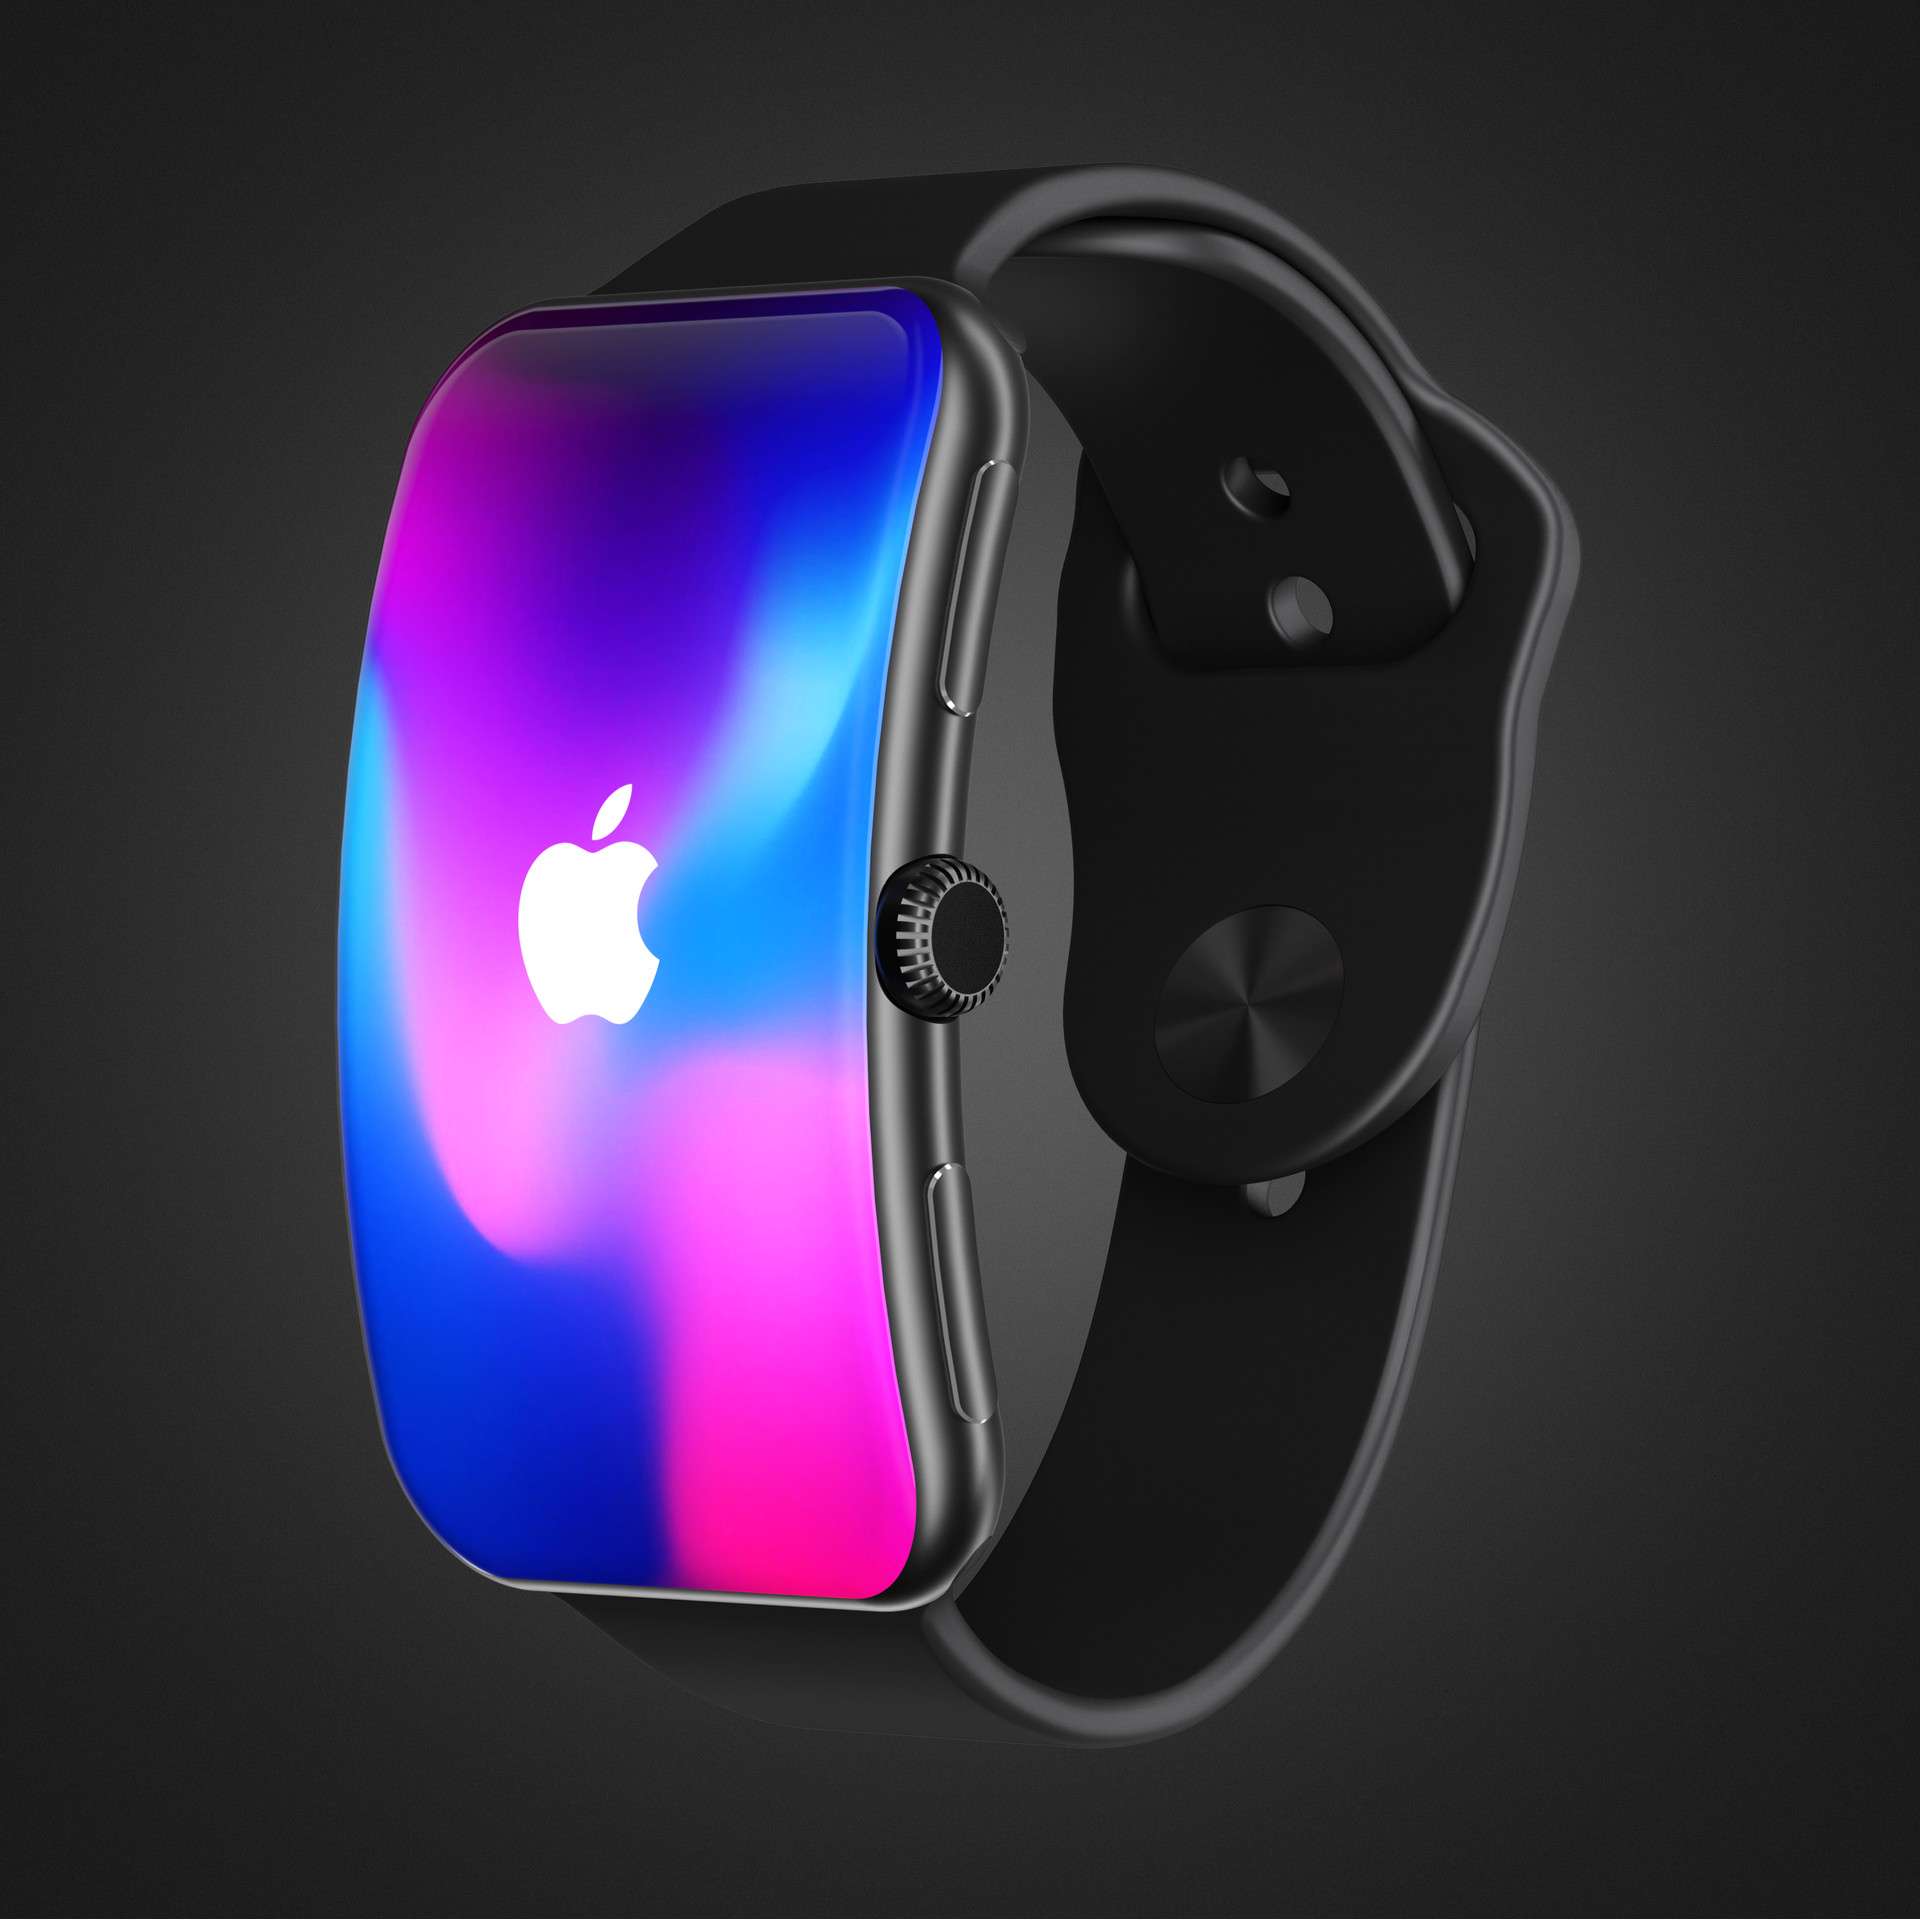 Roman tikhonov apple watch 5 render3